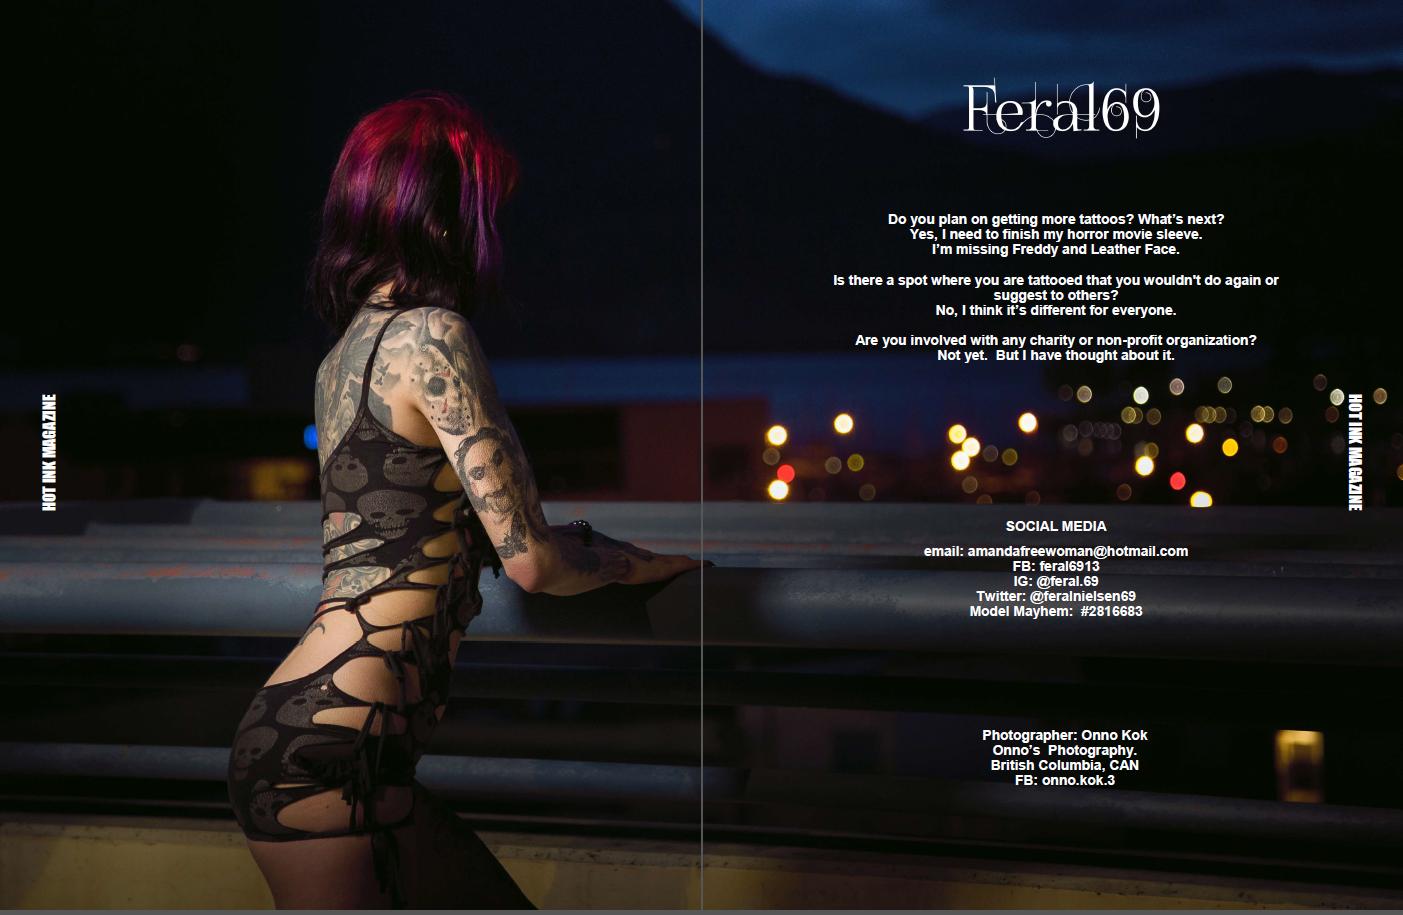 54-55-HI Magazine-F69-Oct2017.jpg